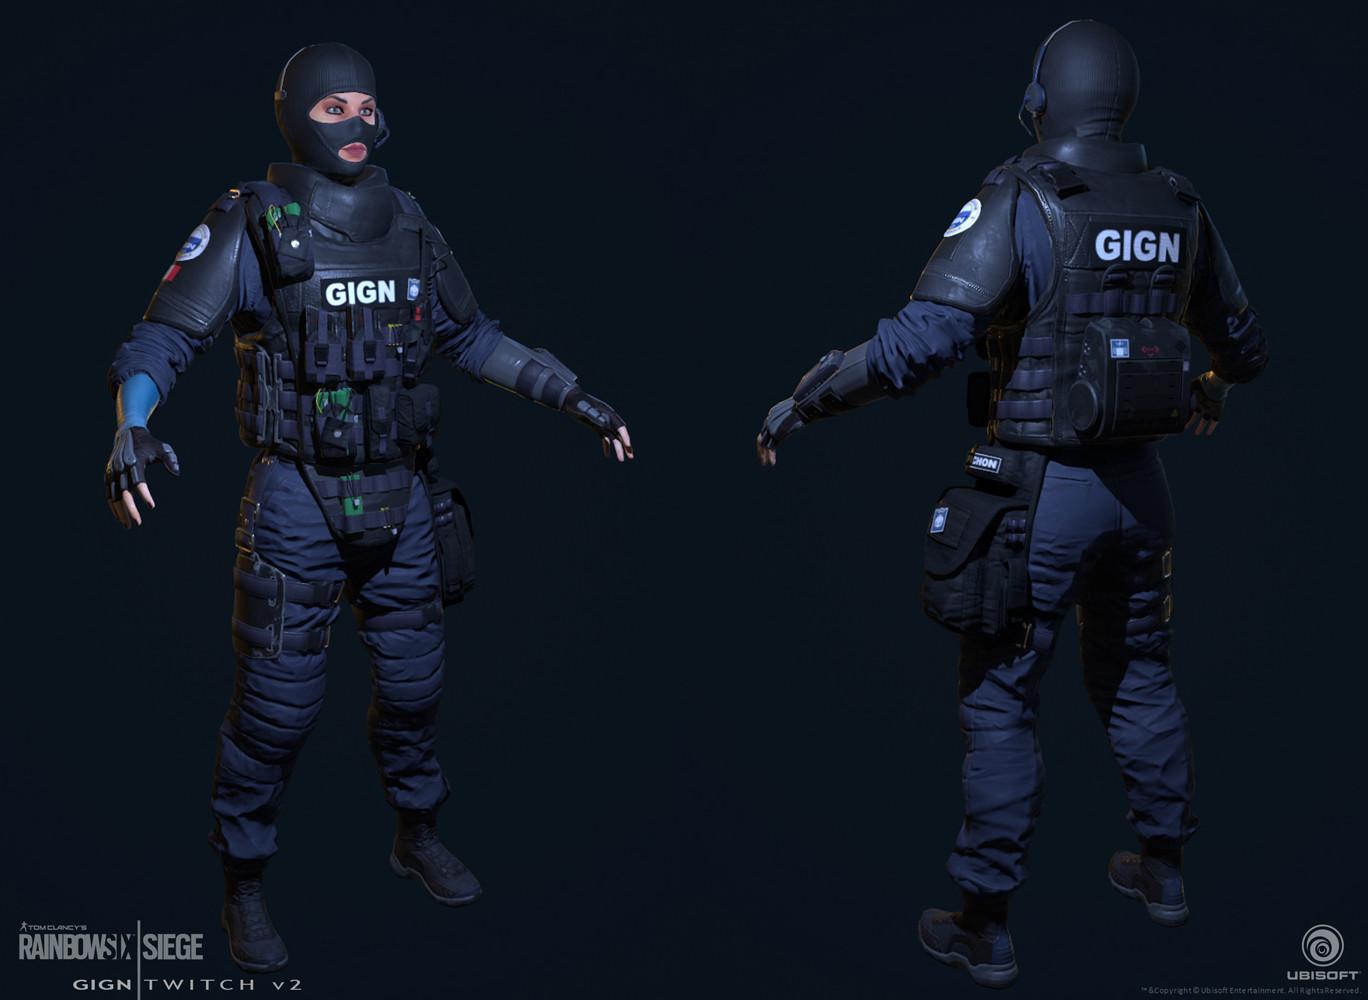 Rainbow Six Siege Gign Operators: Twitch (Design -2) Turn-around (colour).jpg